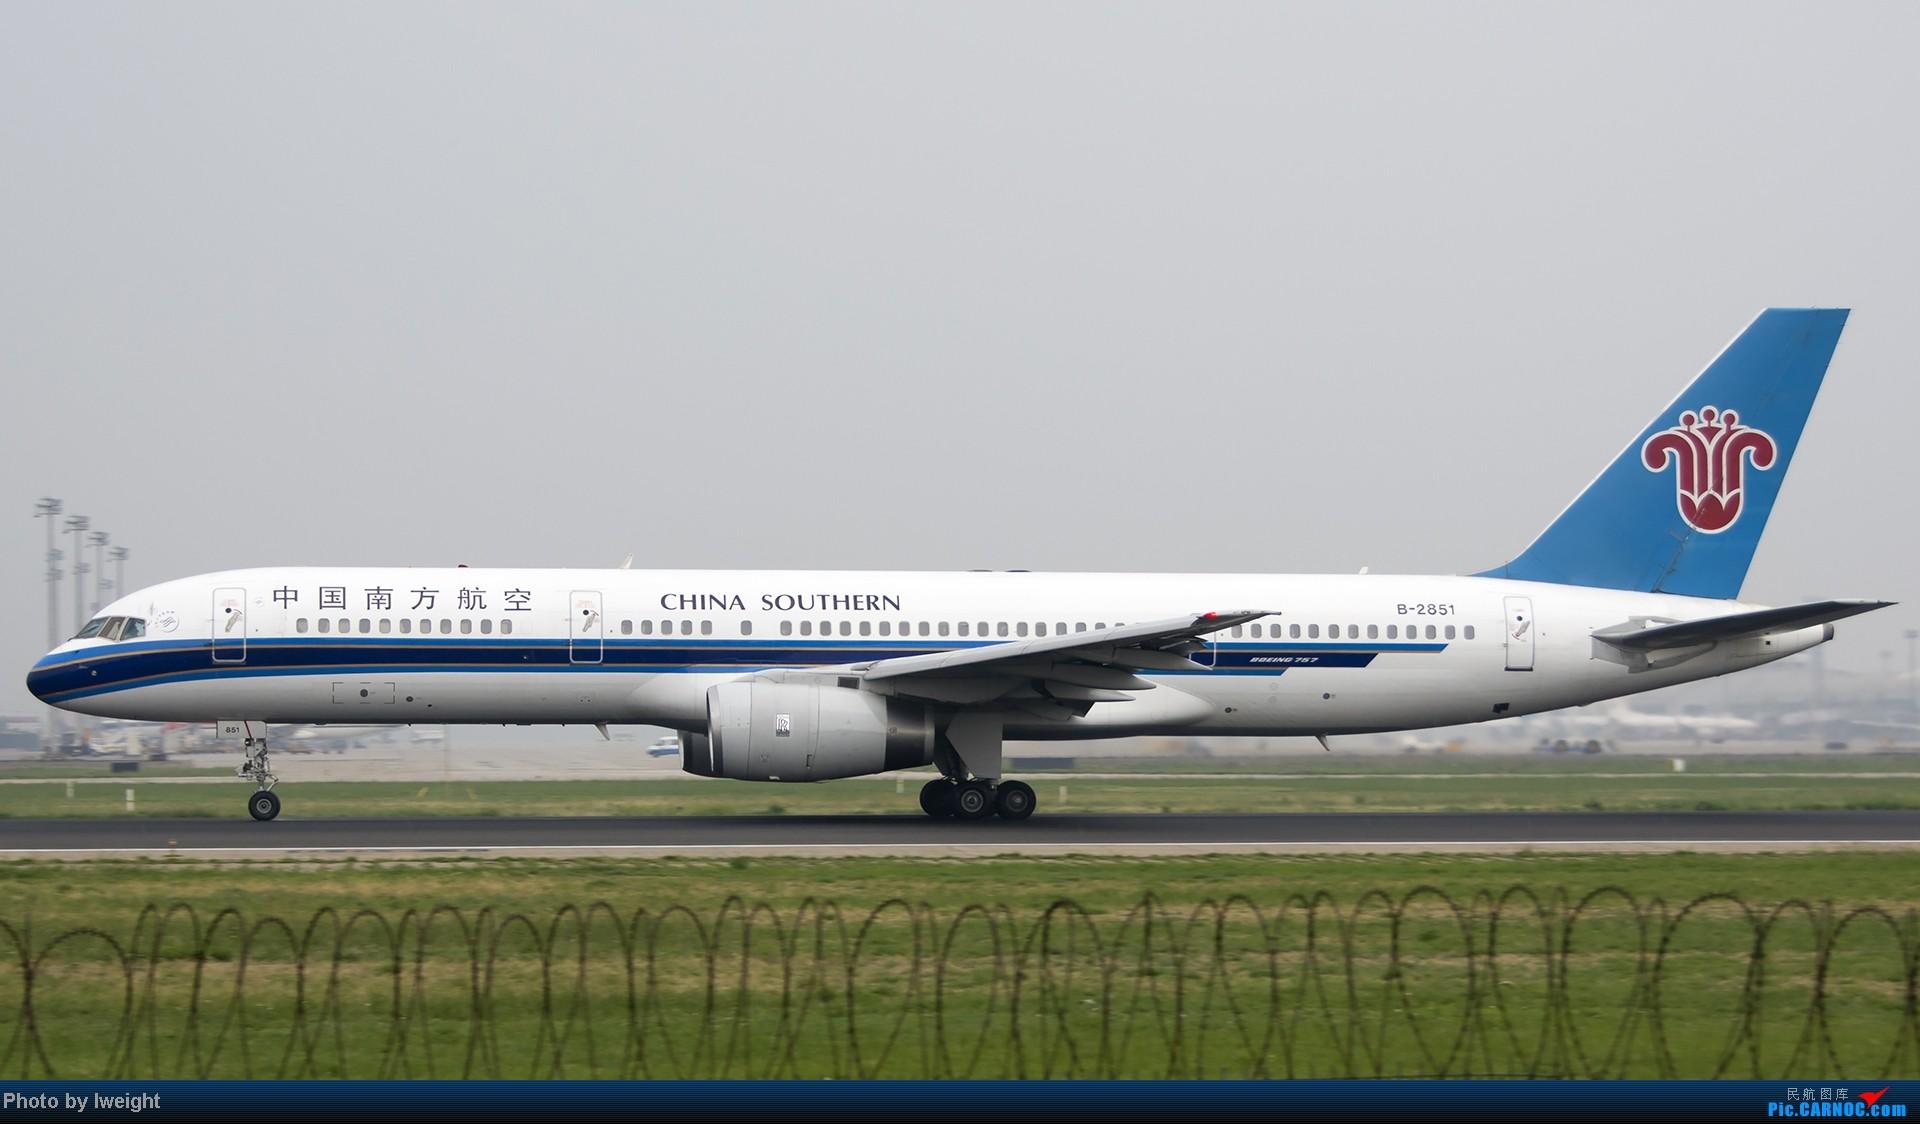 Re:[原创]休假无聊,跑道边来拍机玩(晚点的ZestAir、换装的B6100和刚交付的B2738等) BOEING 757-200 B-2851 中国北京首都机场